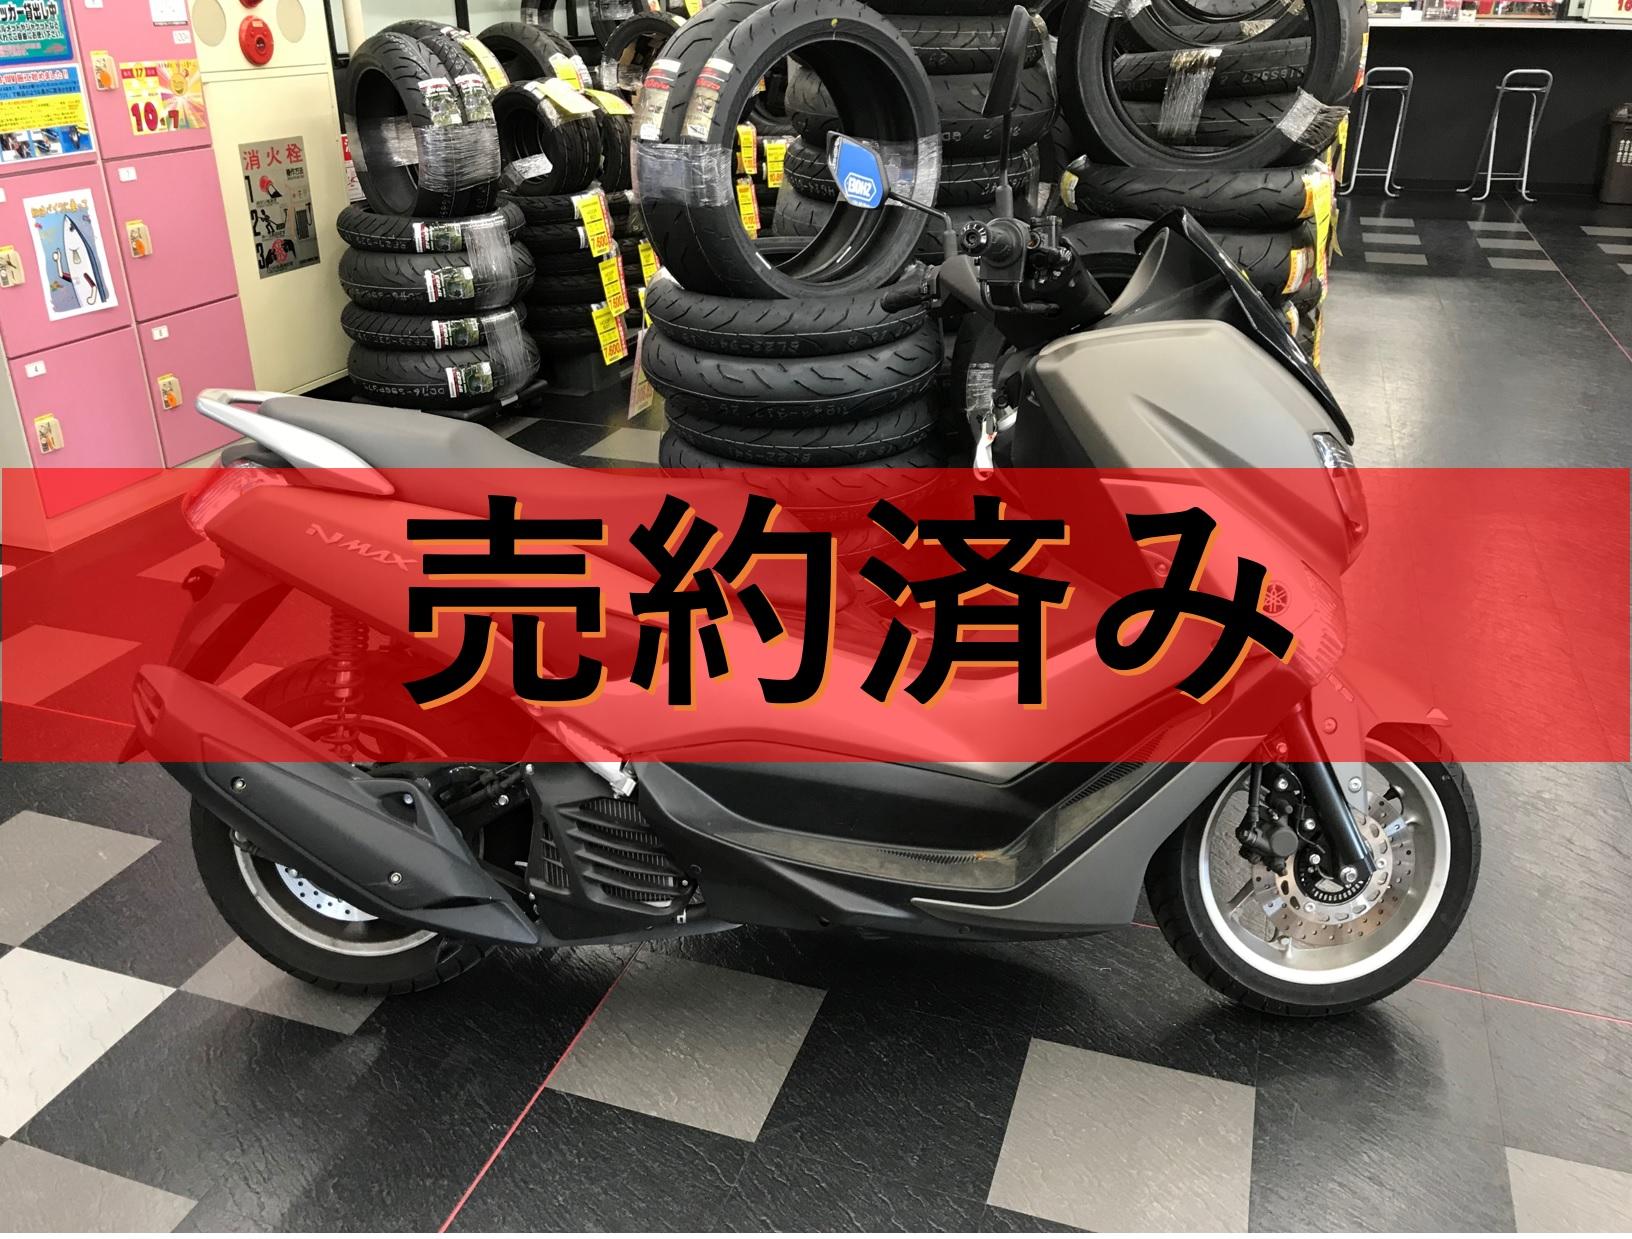 YAMAHA 【販売車両】N MAX